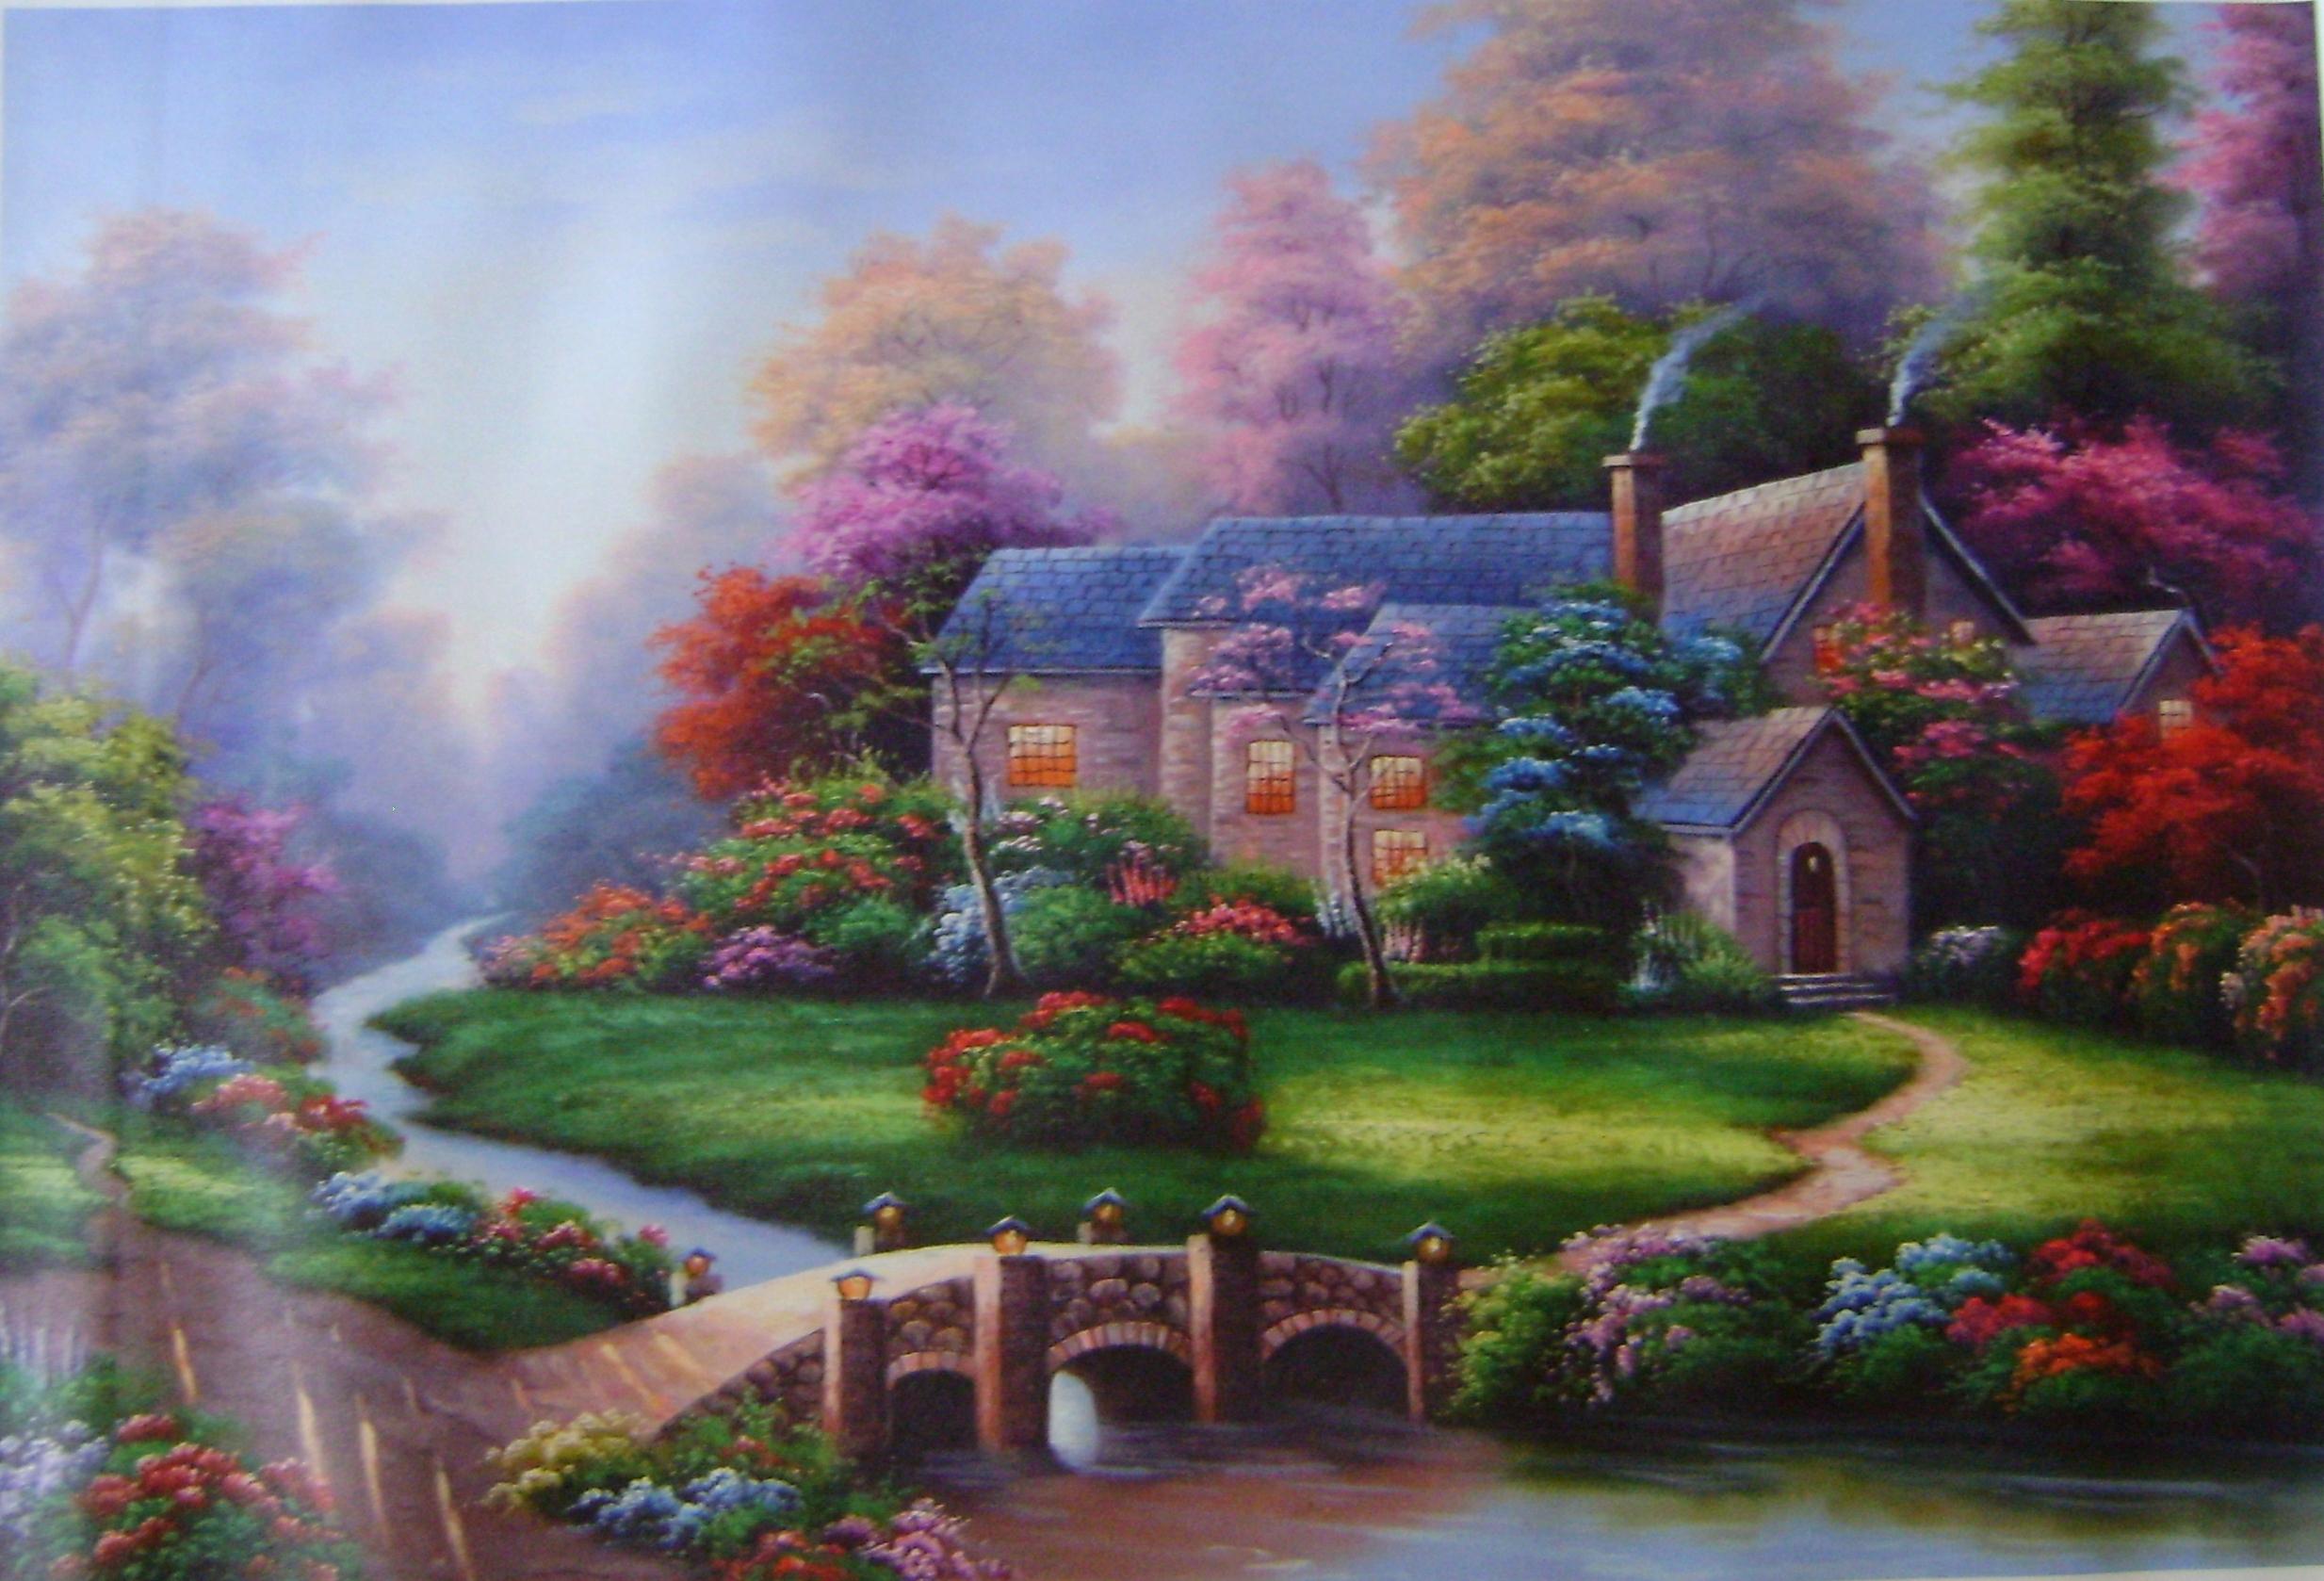 imagens jardim florido:JARDIM FLORIDO JARDIM FLORIDO JARDIM FLORIDO JARDIM FLORIDO JARDIM